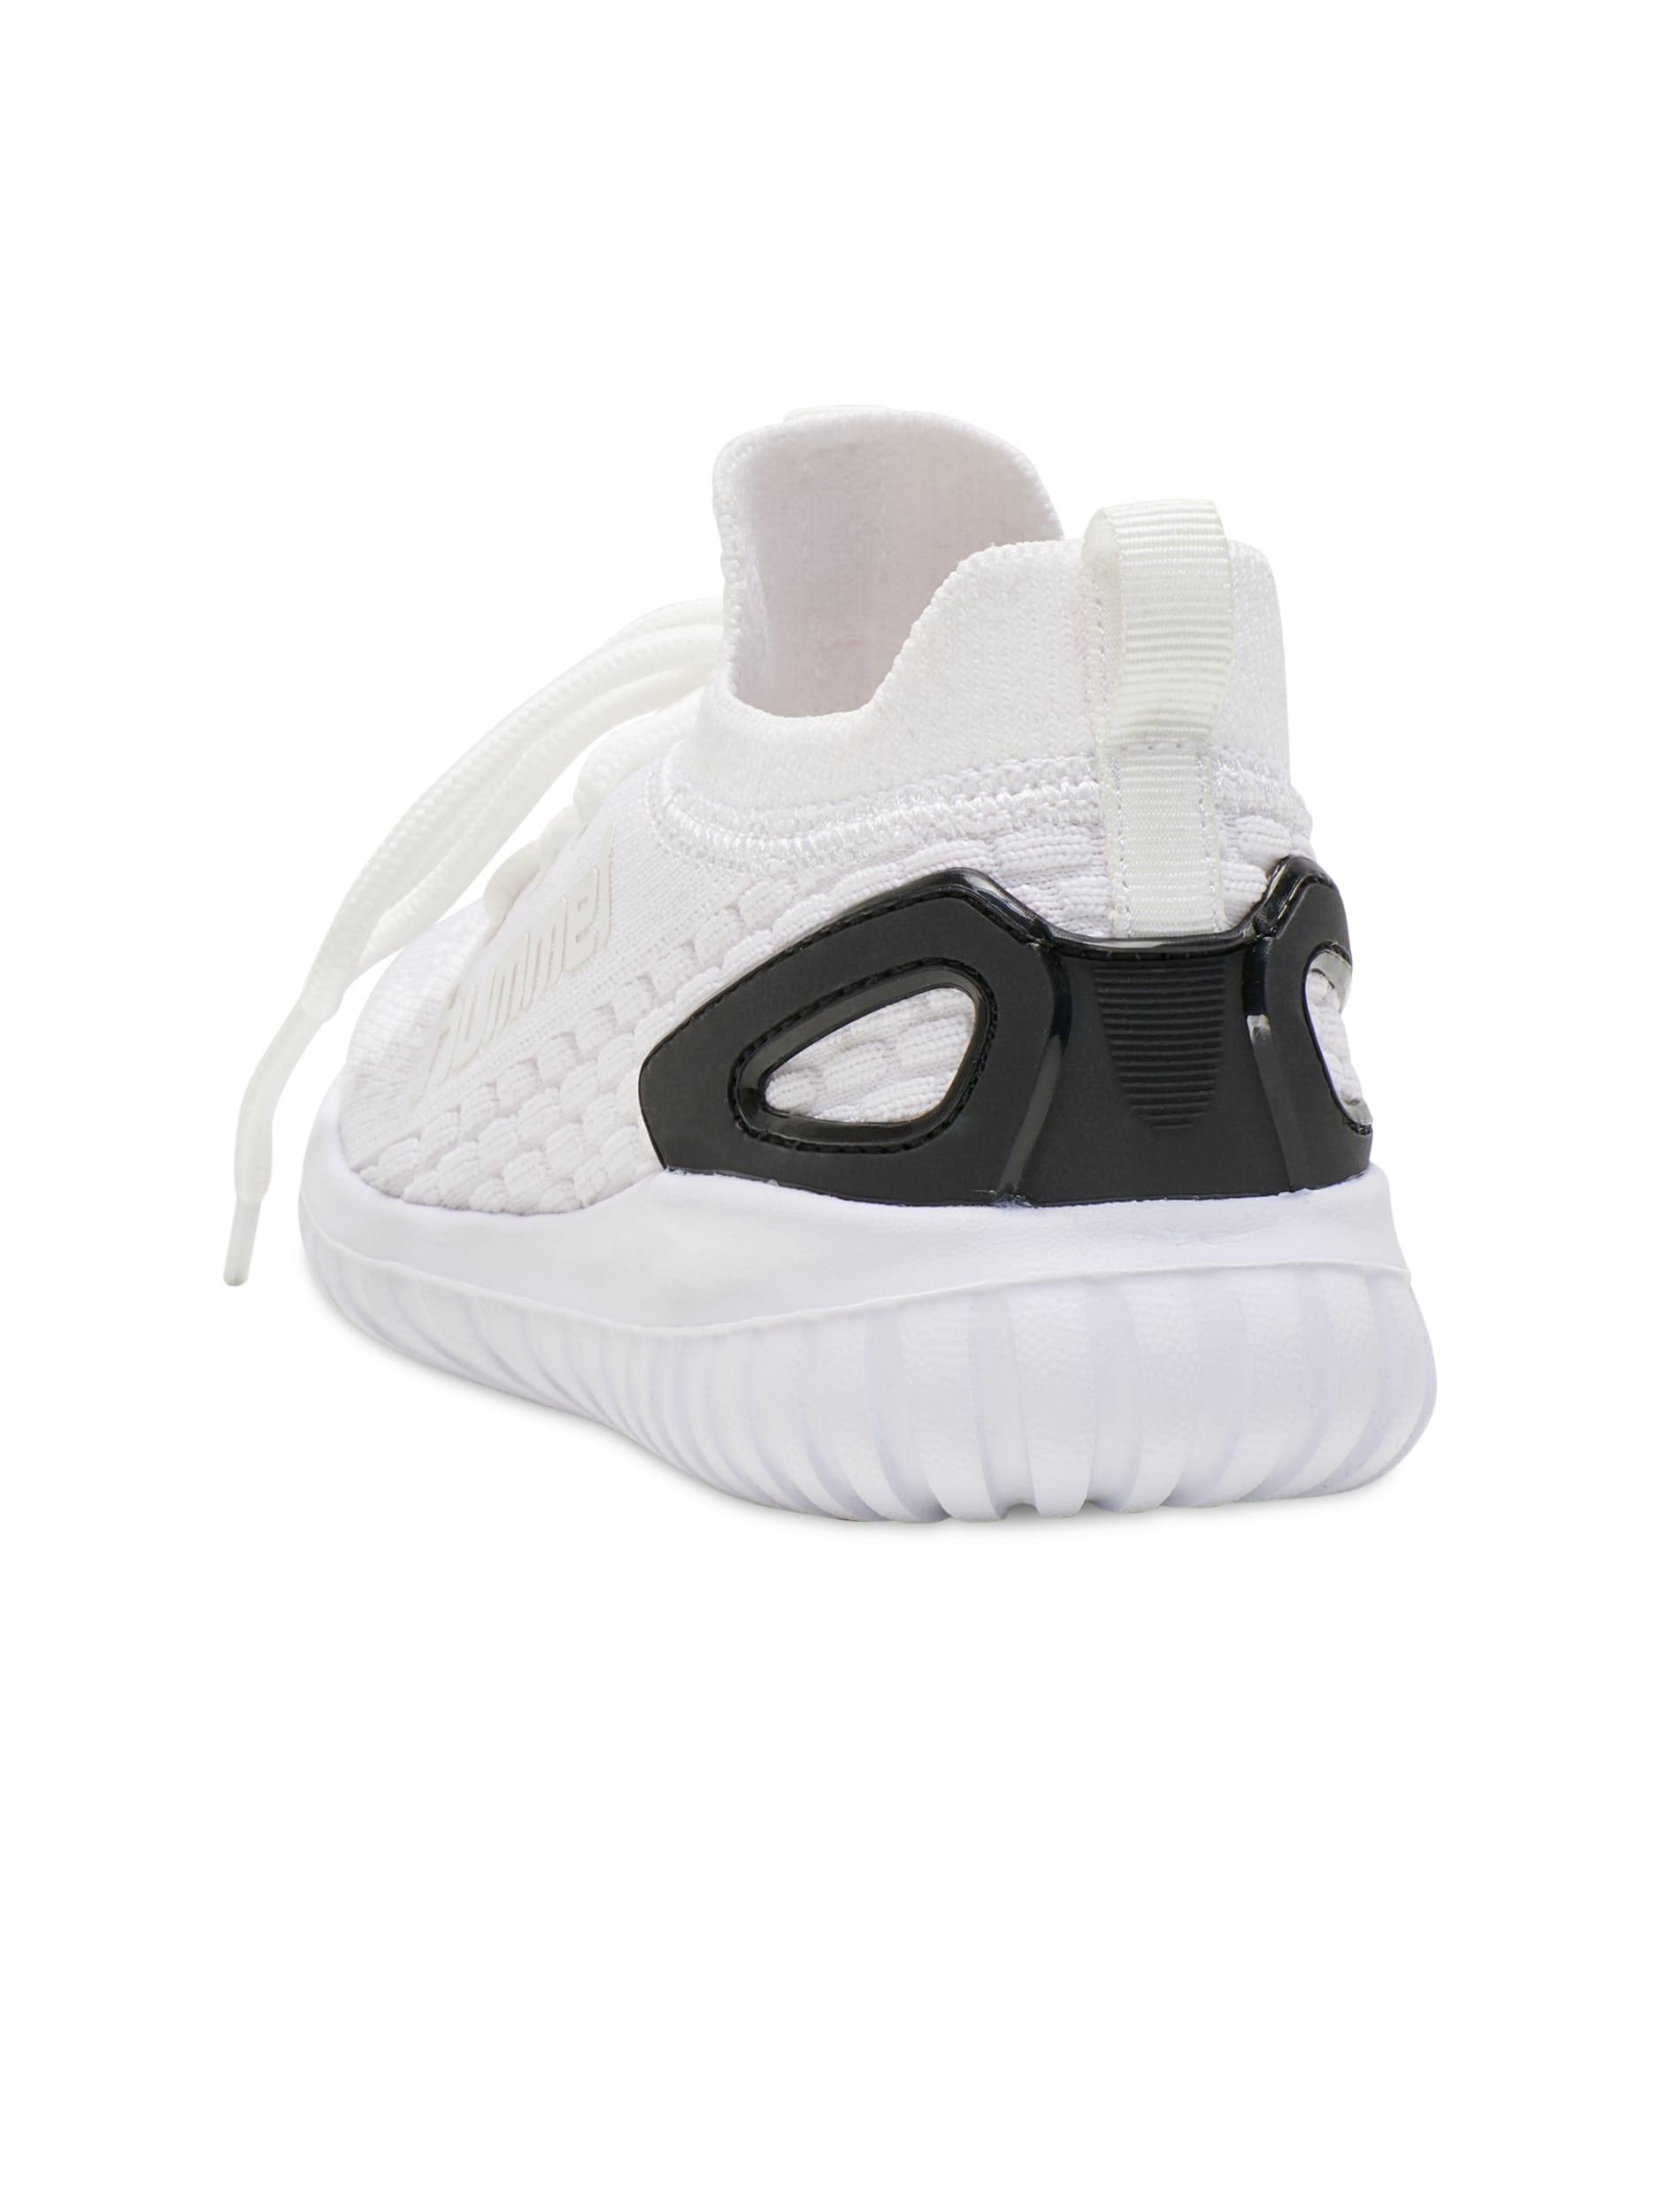 Hummel Knit Runner Recycle, white, 35